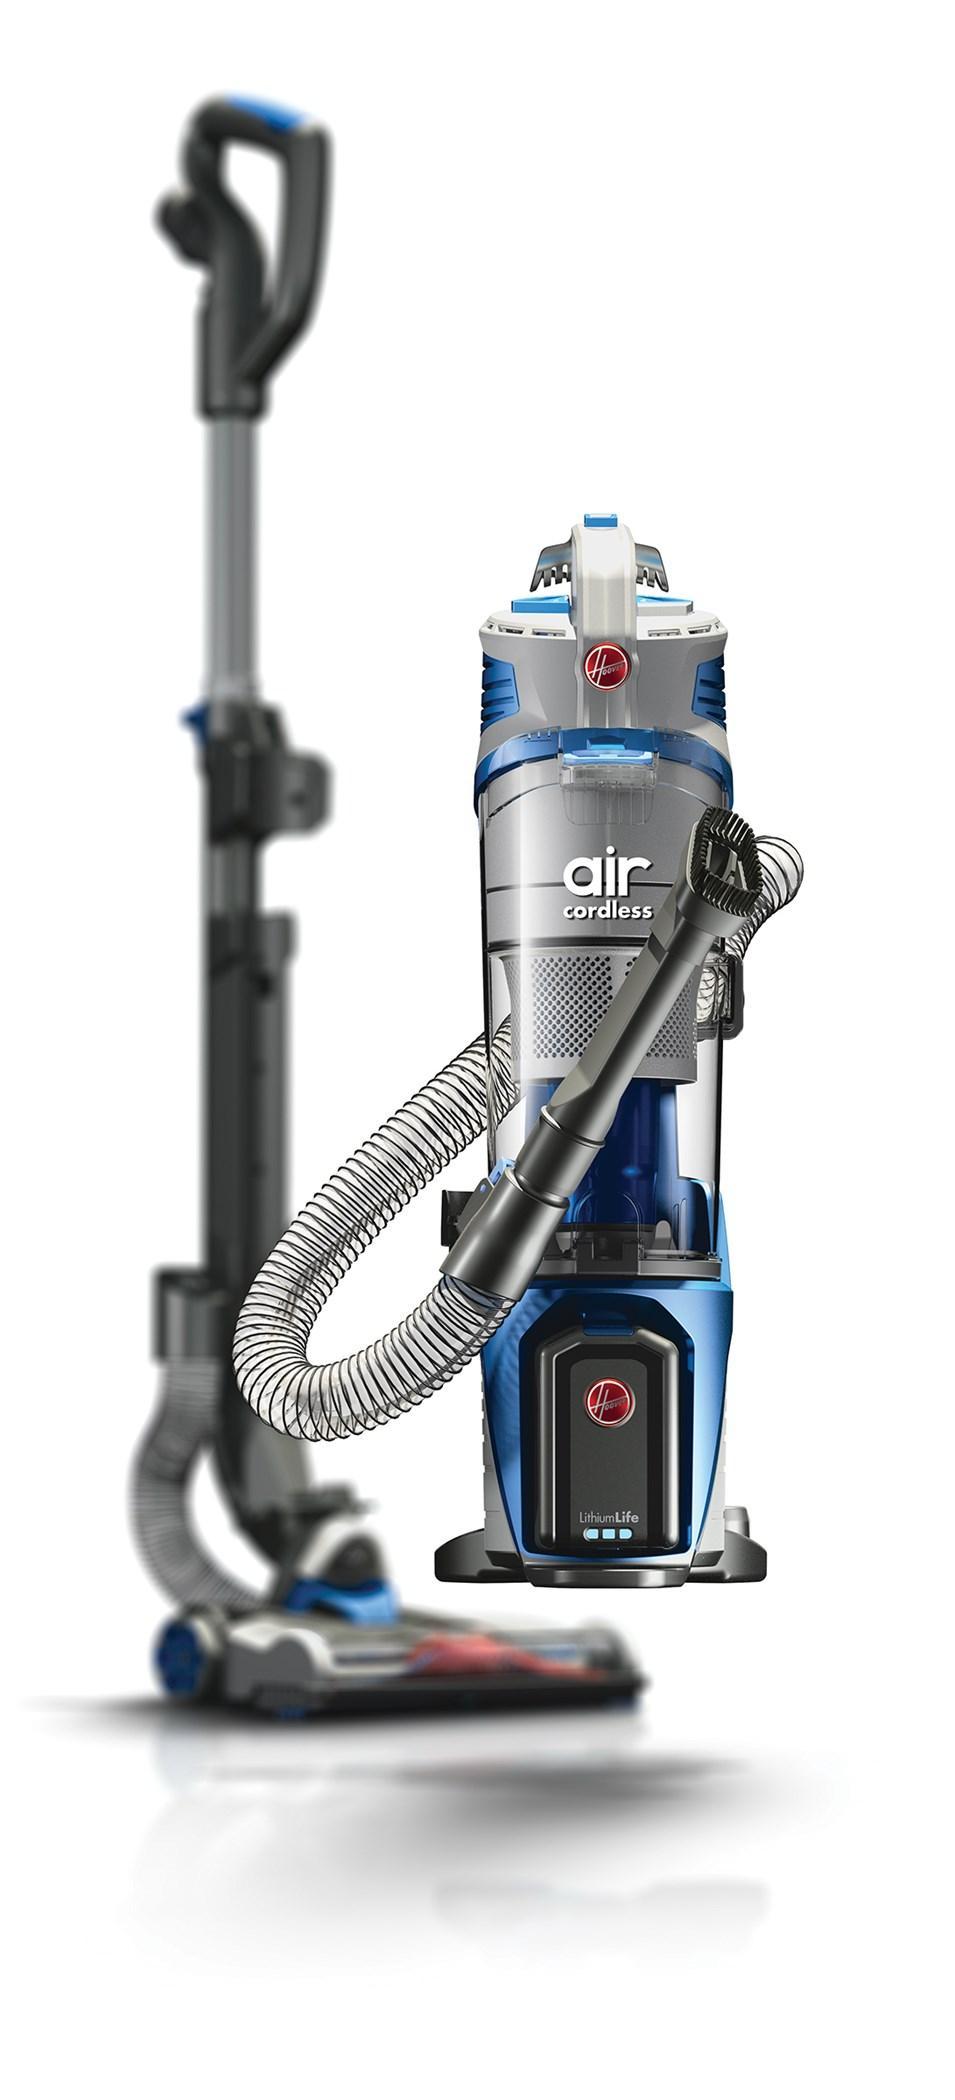 hoover vacuum cleaner air lift 20 volt lithium. Black Bedroom Furniture Sets. Home Design Ideas